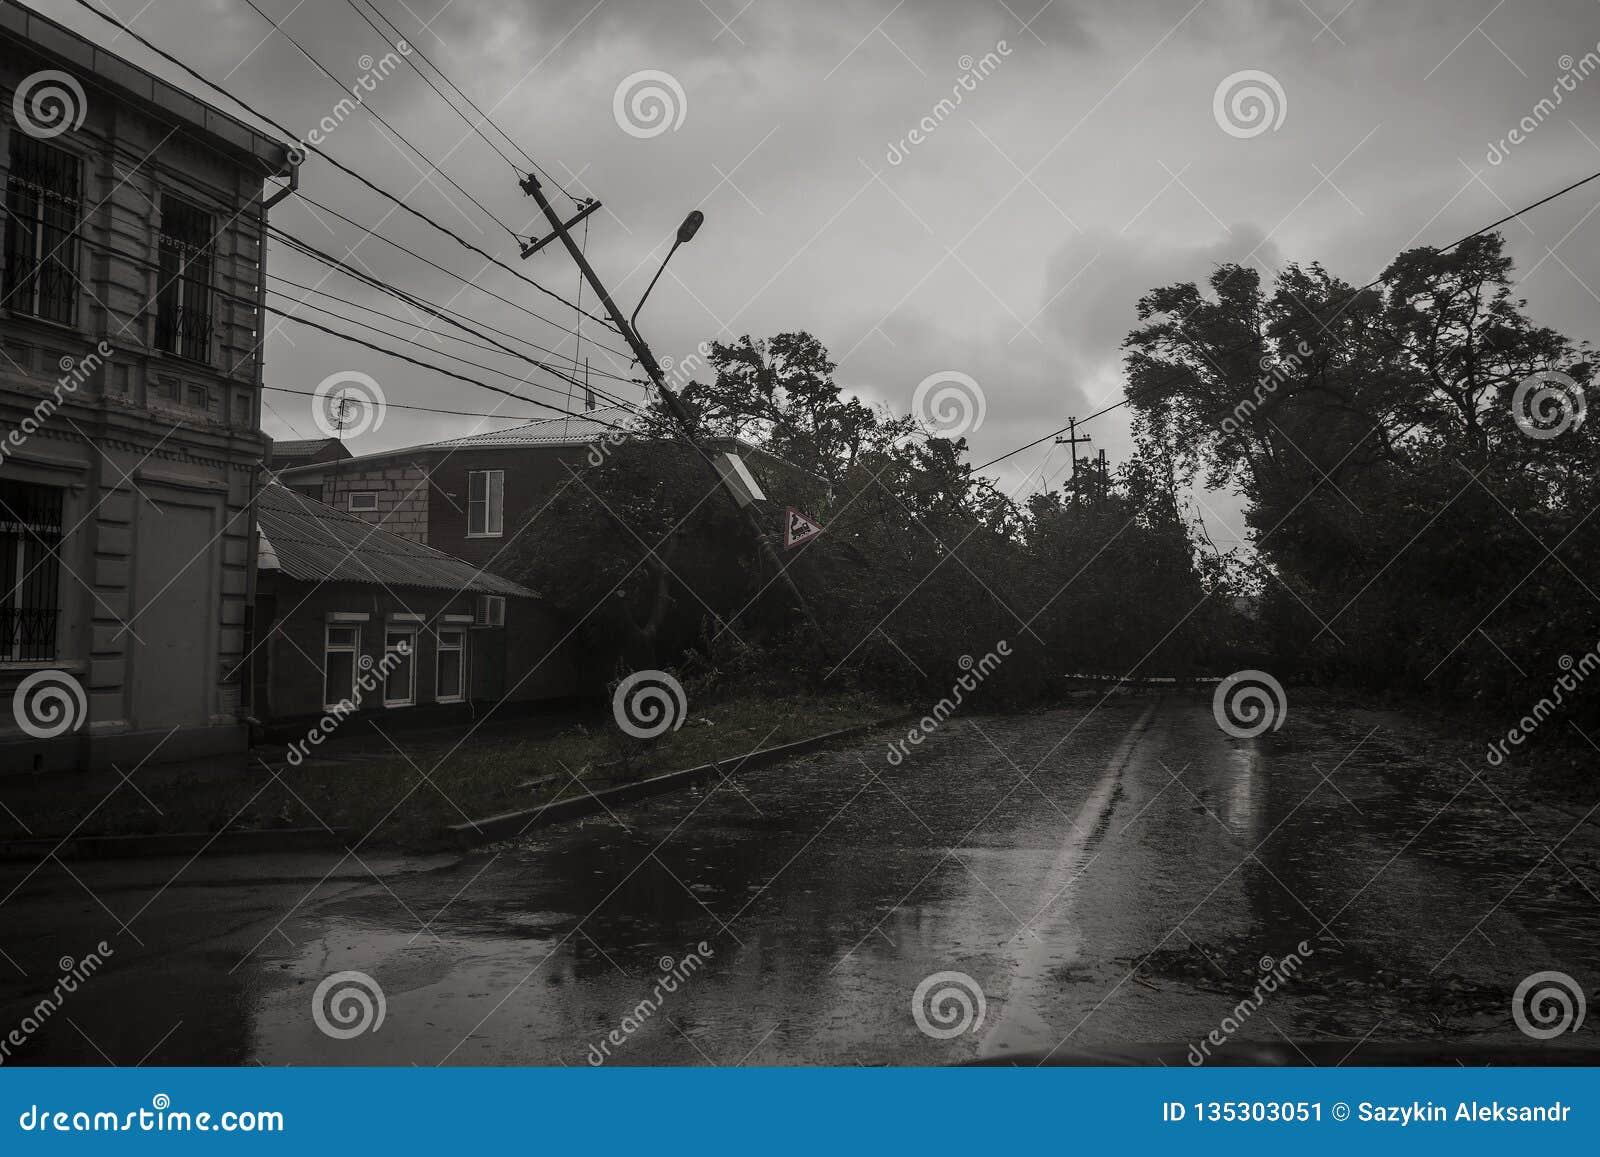 Huragan w mieście Taganrog, Rostov region, federacja rosyjska Wrzesień 24, 2014